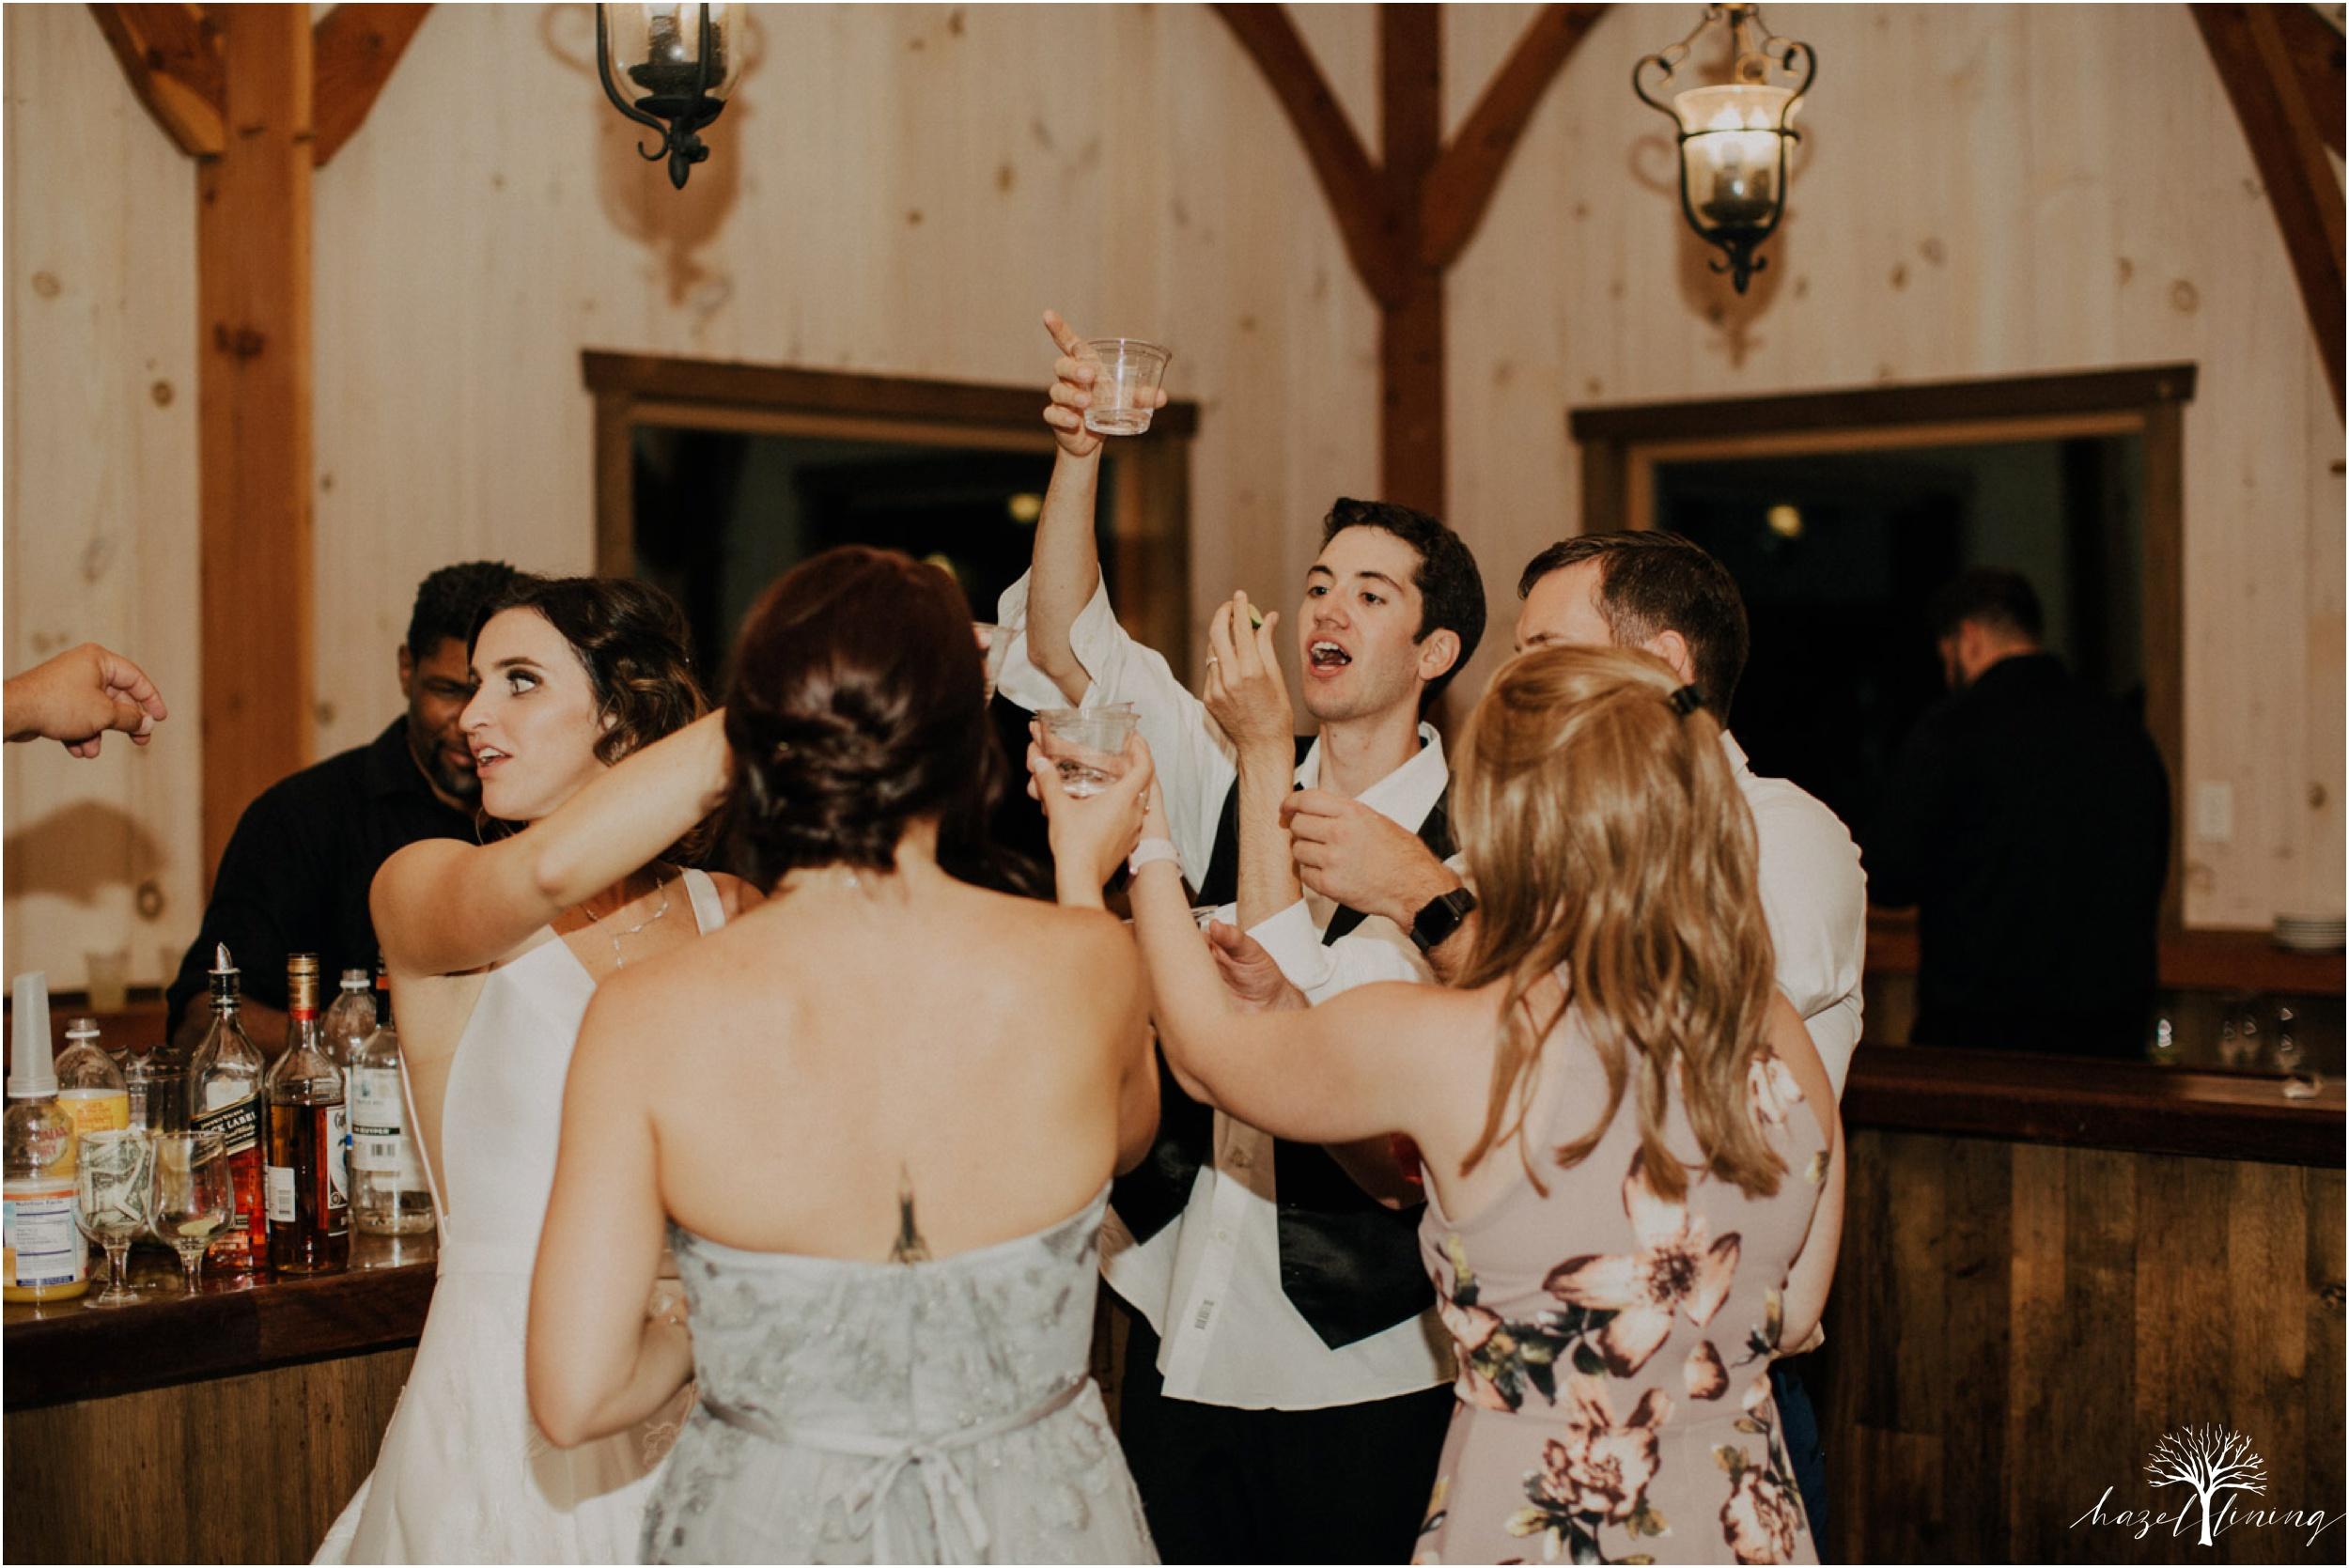 maureen-hepner-anthony-giordano-rose-bank-winery-newtow-pennsylvania-luxury-summer-wedding-hazel-lining-photography-destination-elopement-wedding-engagement-photography_0157.jpg